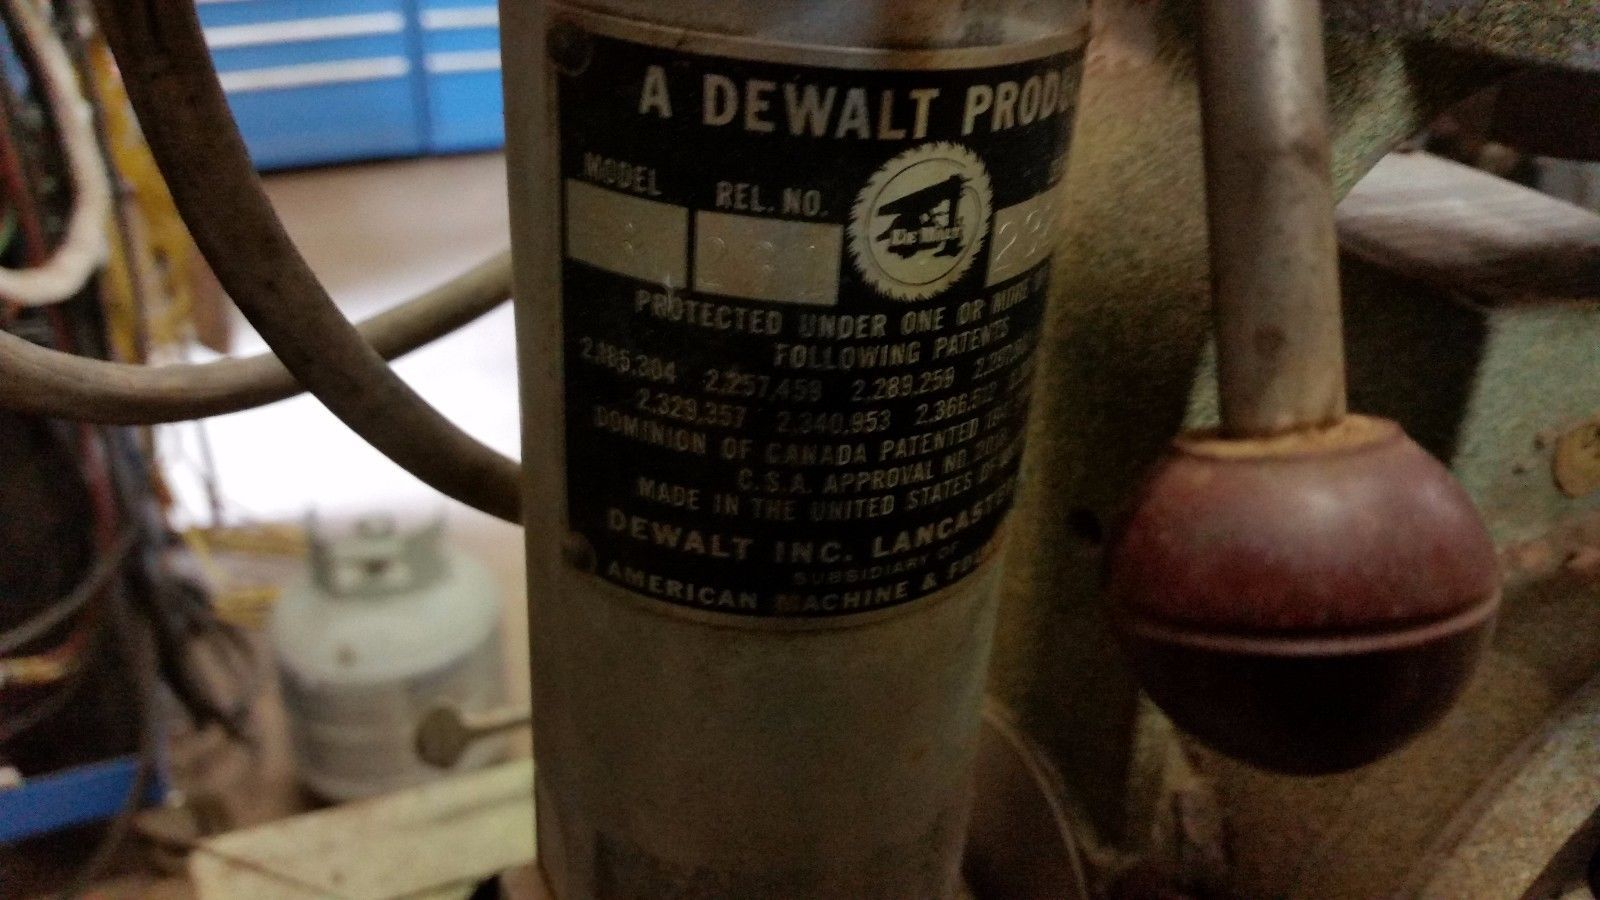 AMF DEWALT mini size Radial Arm Saw Model MBF